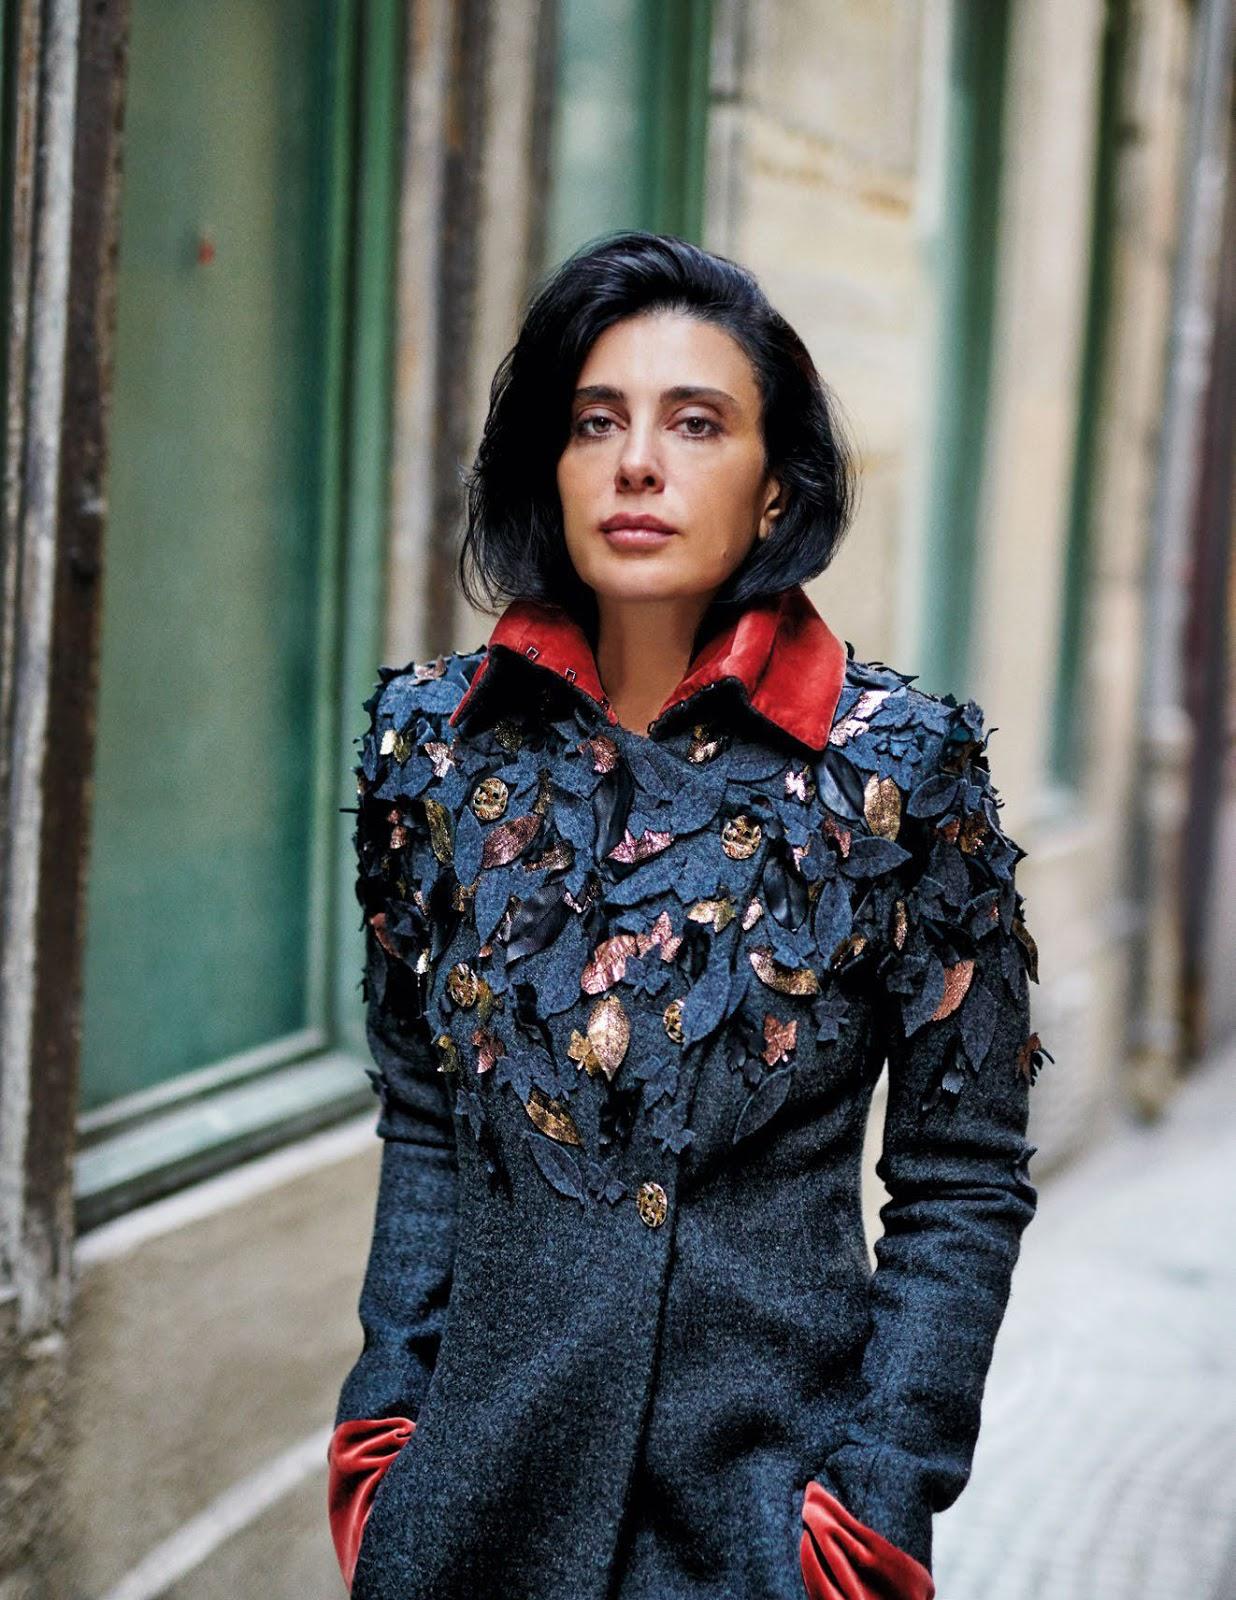 Nadine Labaki by Drew Jarrett for Vogue Arabia Oct 2018 (8).jpg